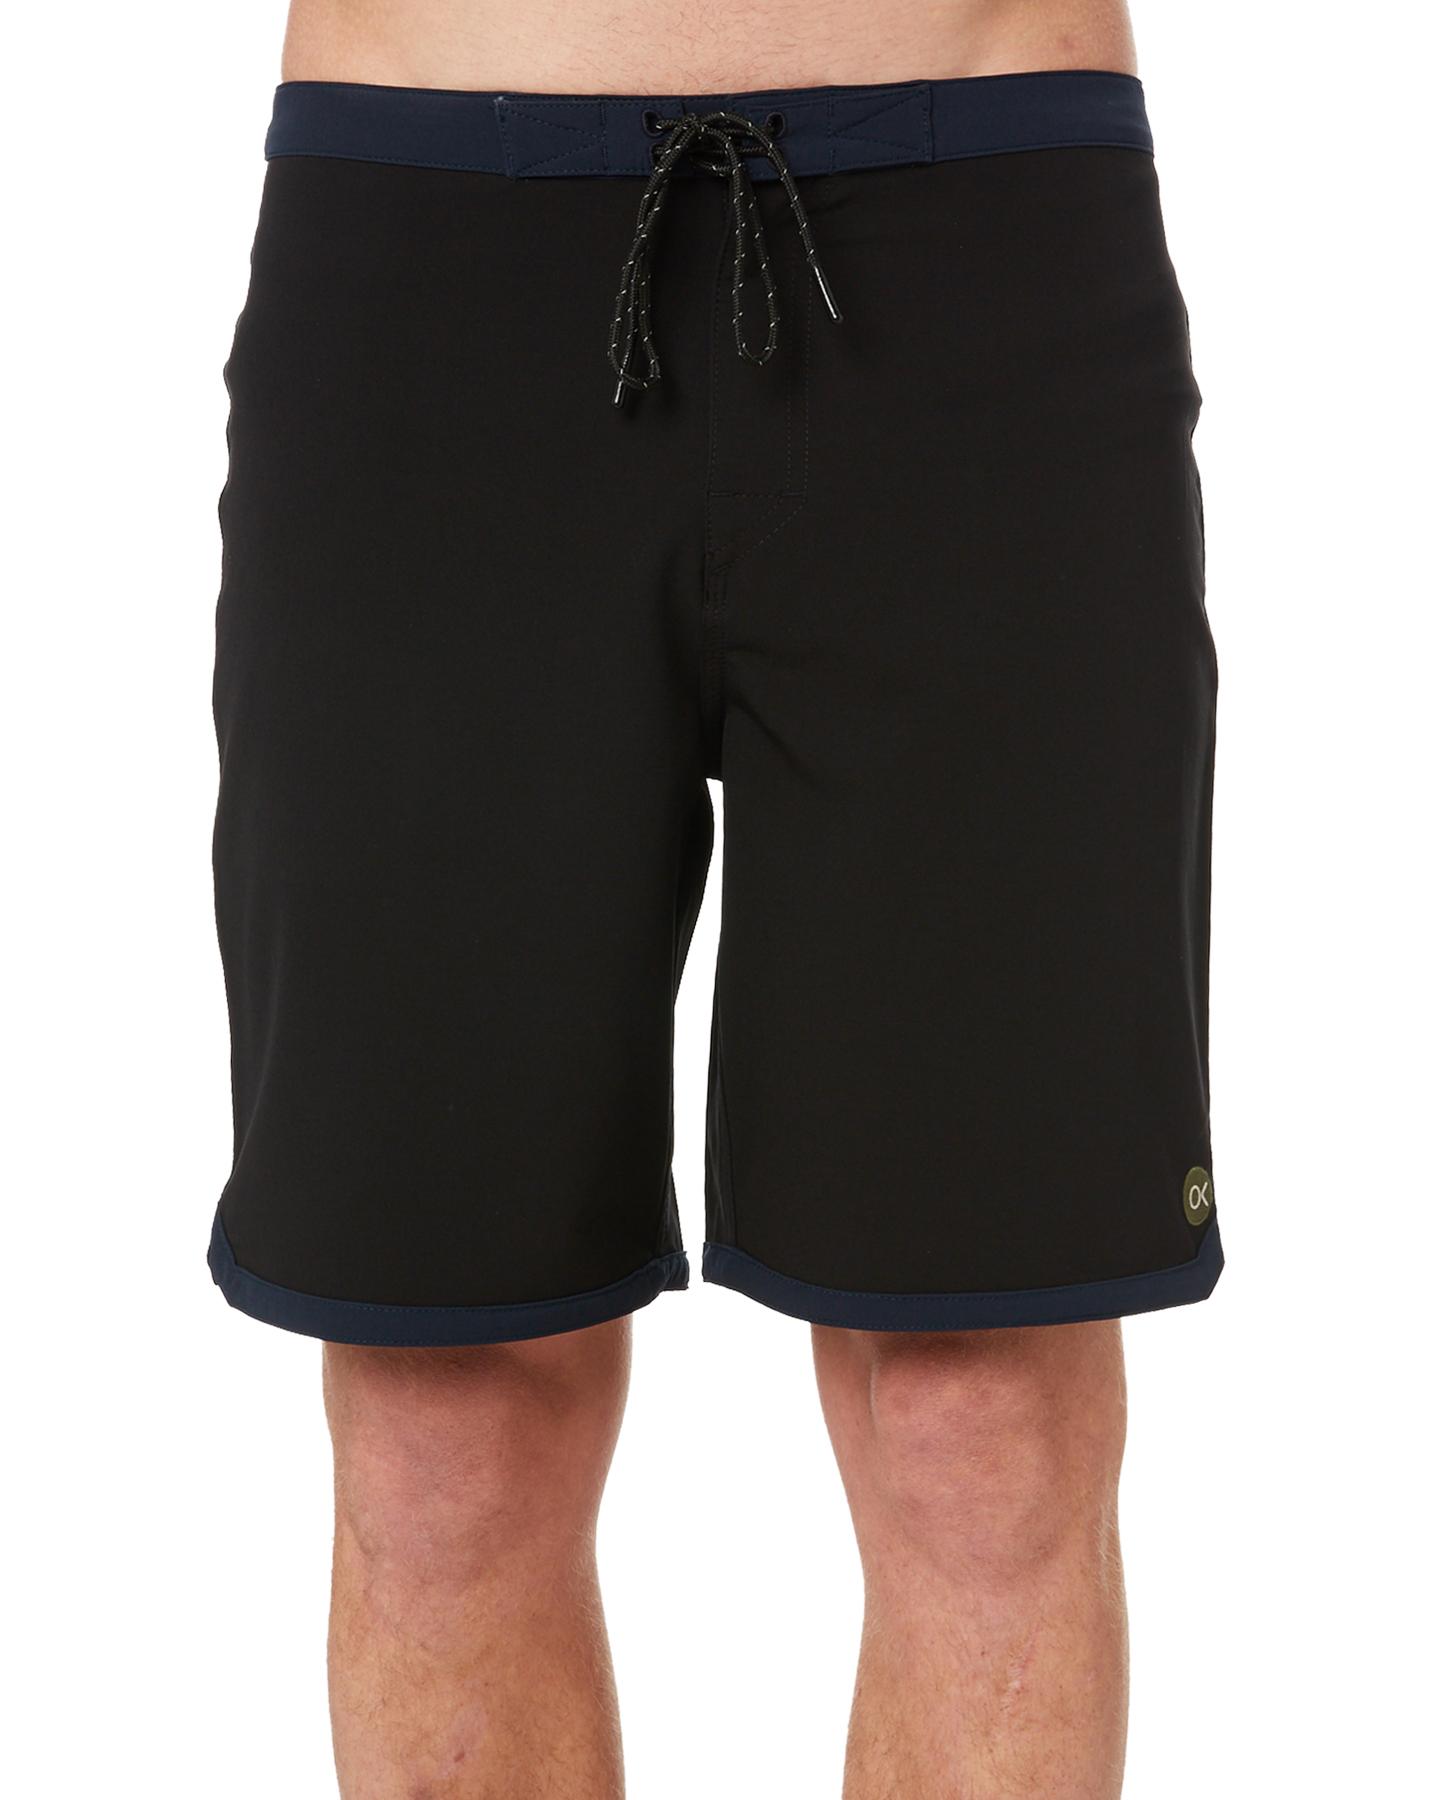 bc6afcfe2e New Outerknown Men's Modern Scallop Mens Boardshort Plastic Stretch ...